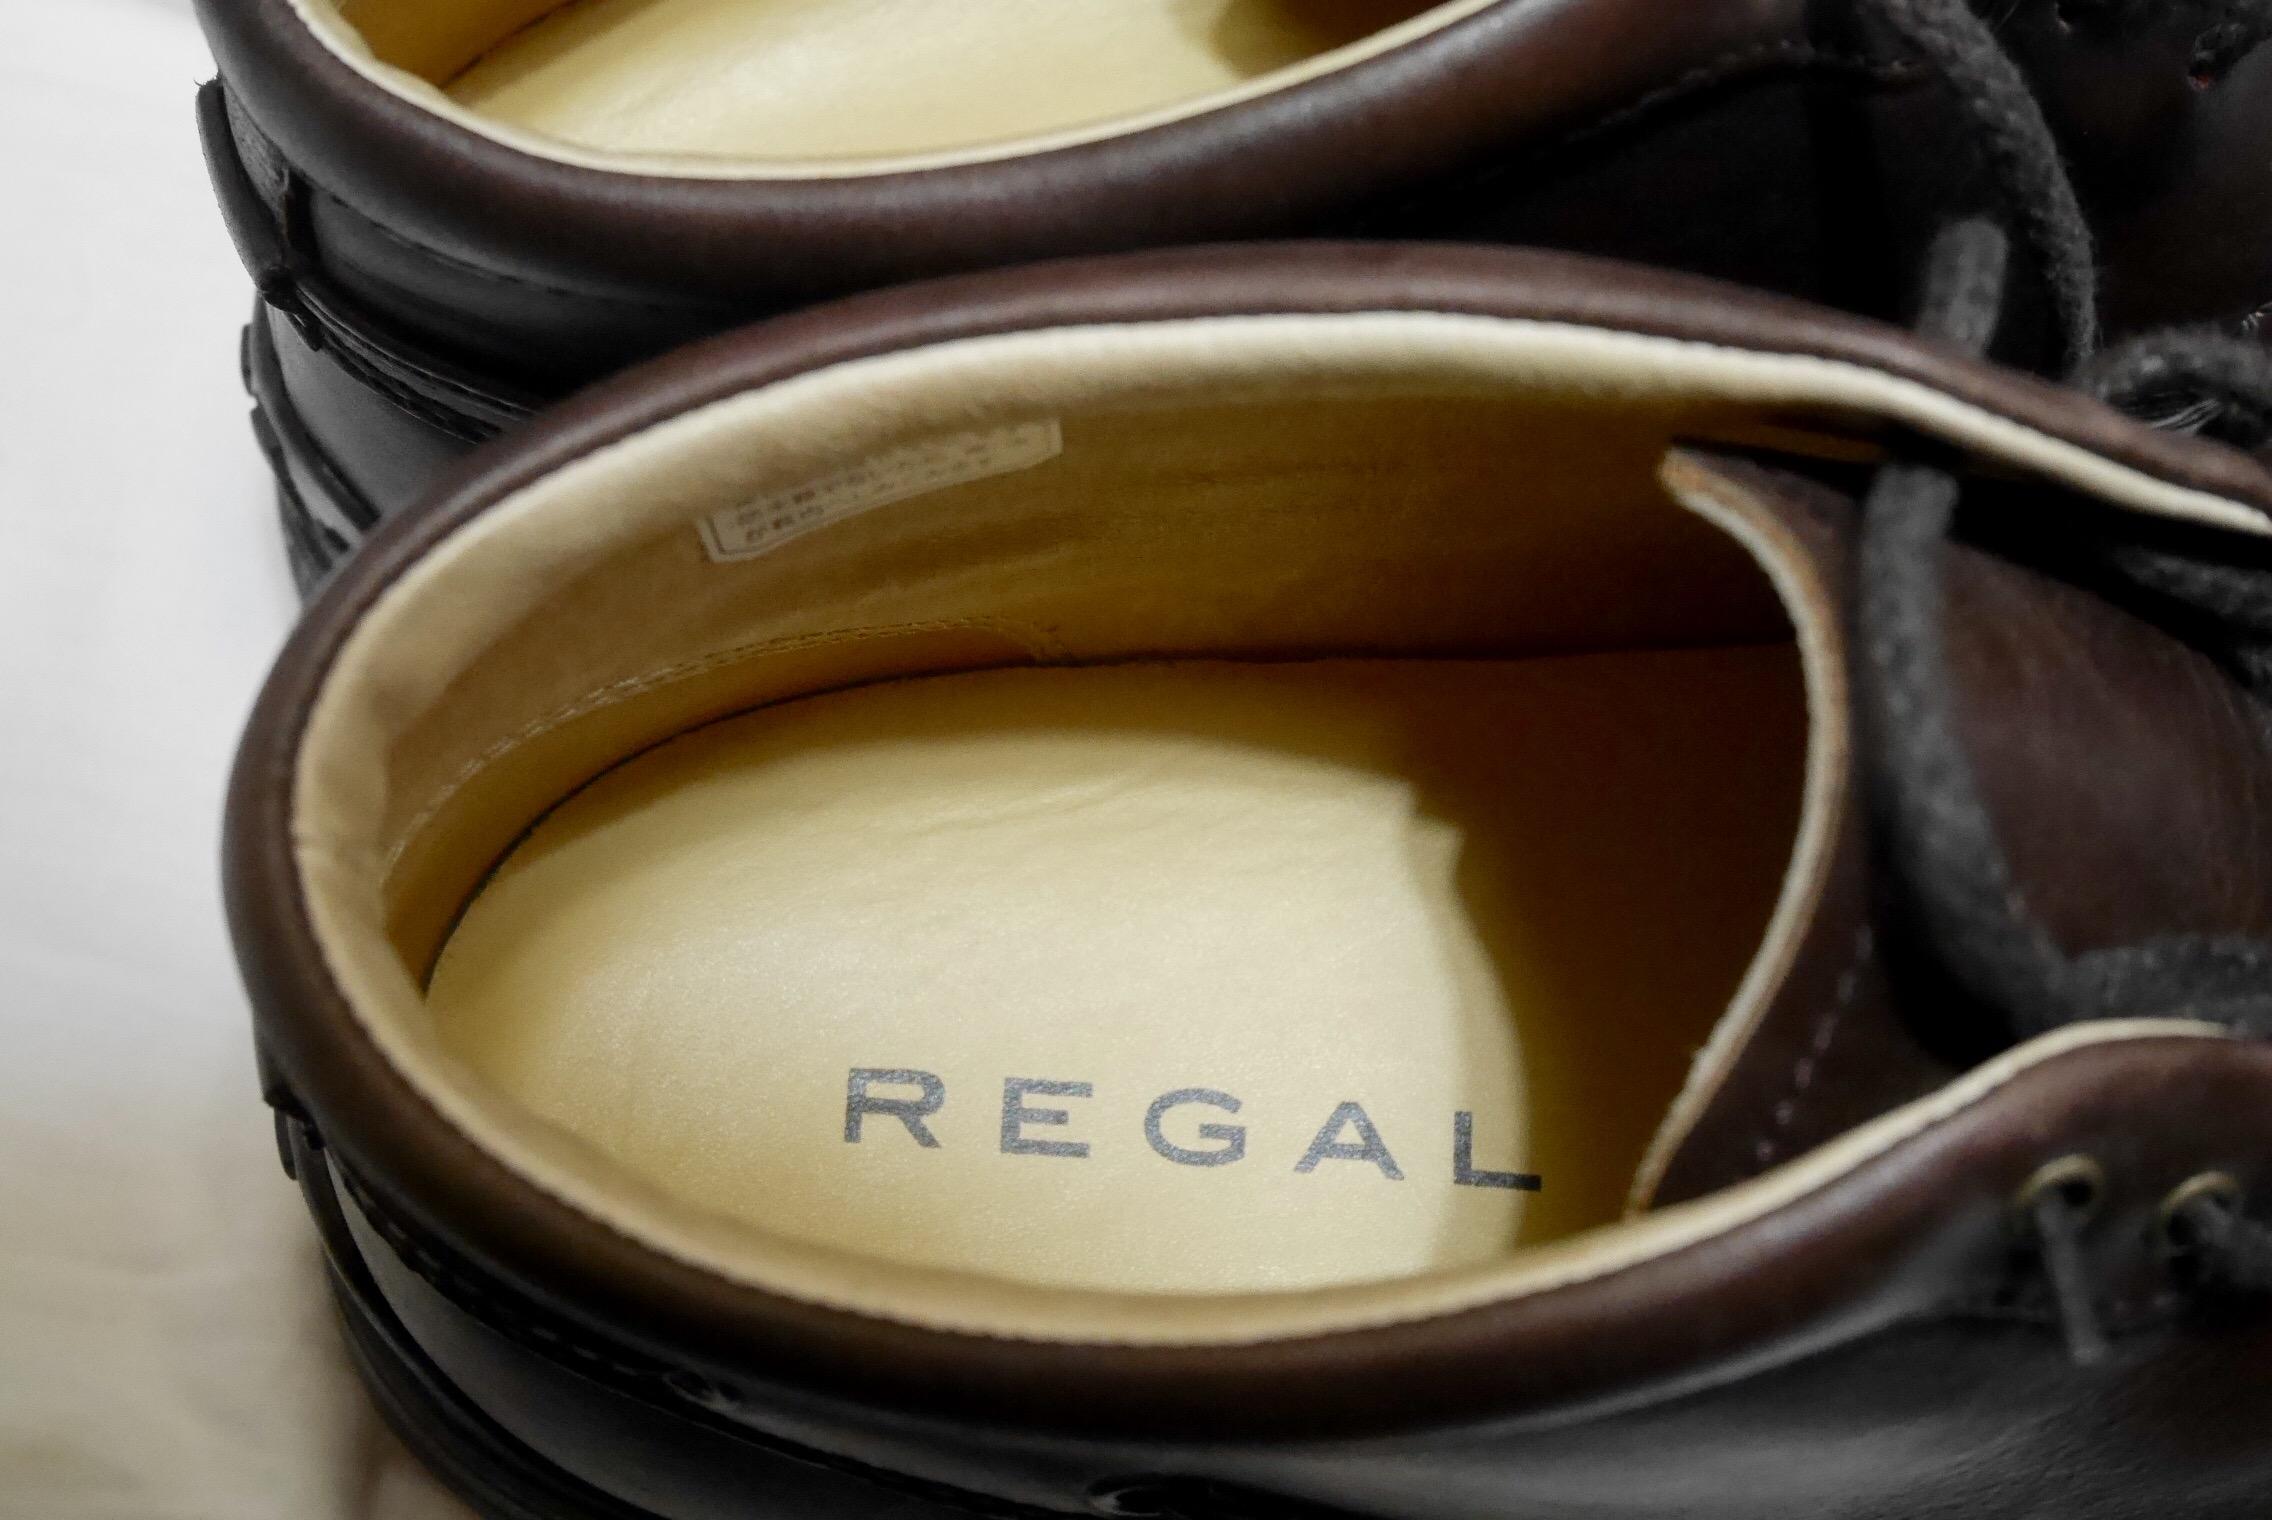 REGALの革靴で歩いた時に音が鳴るのを防ぐ